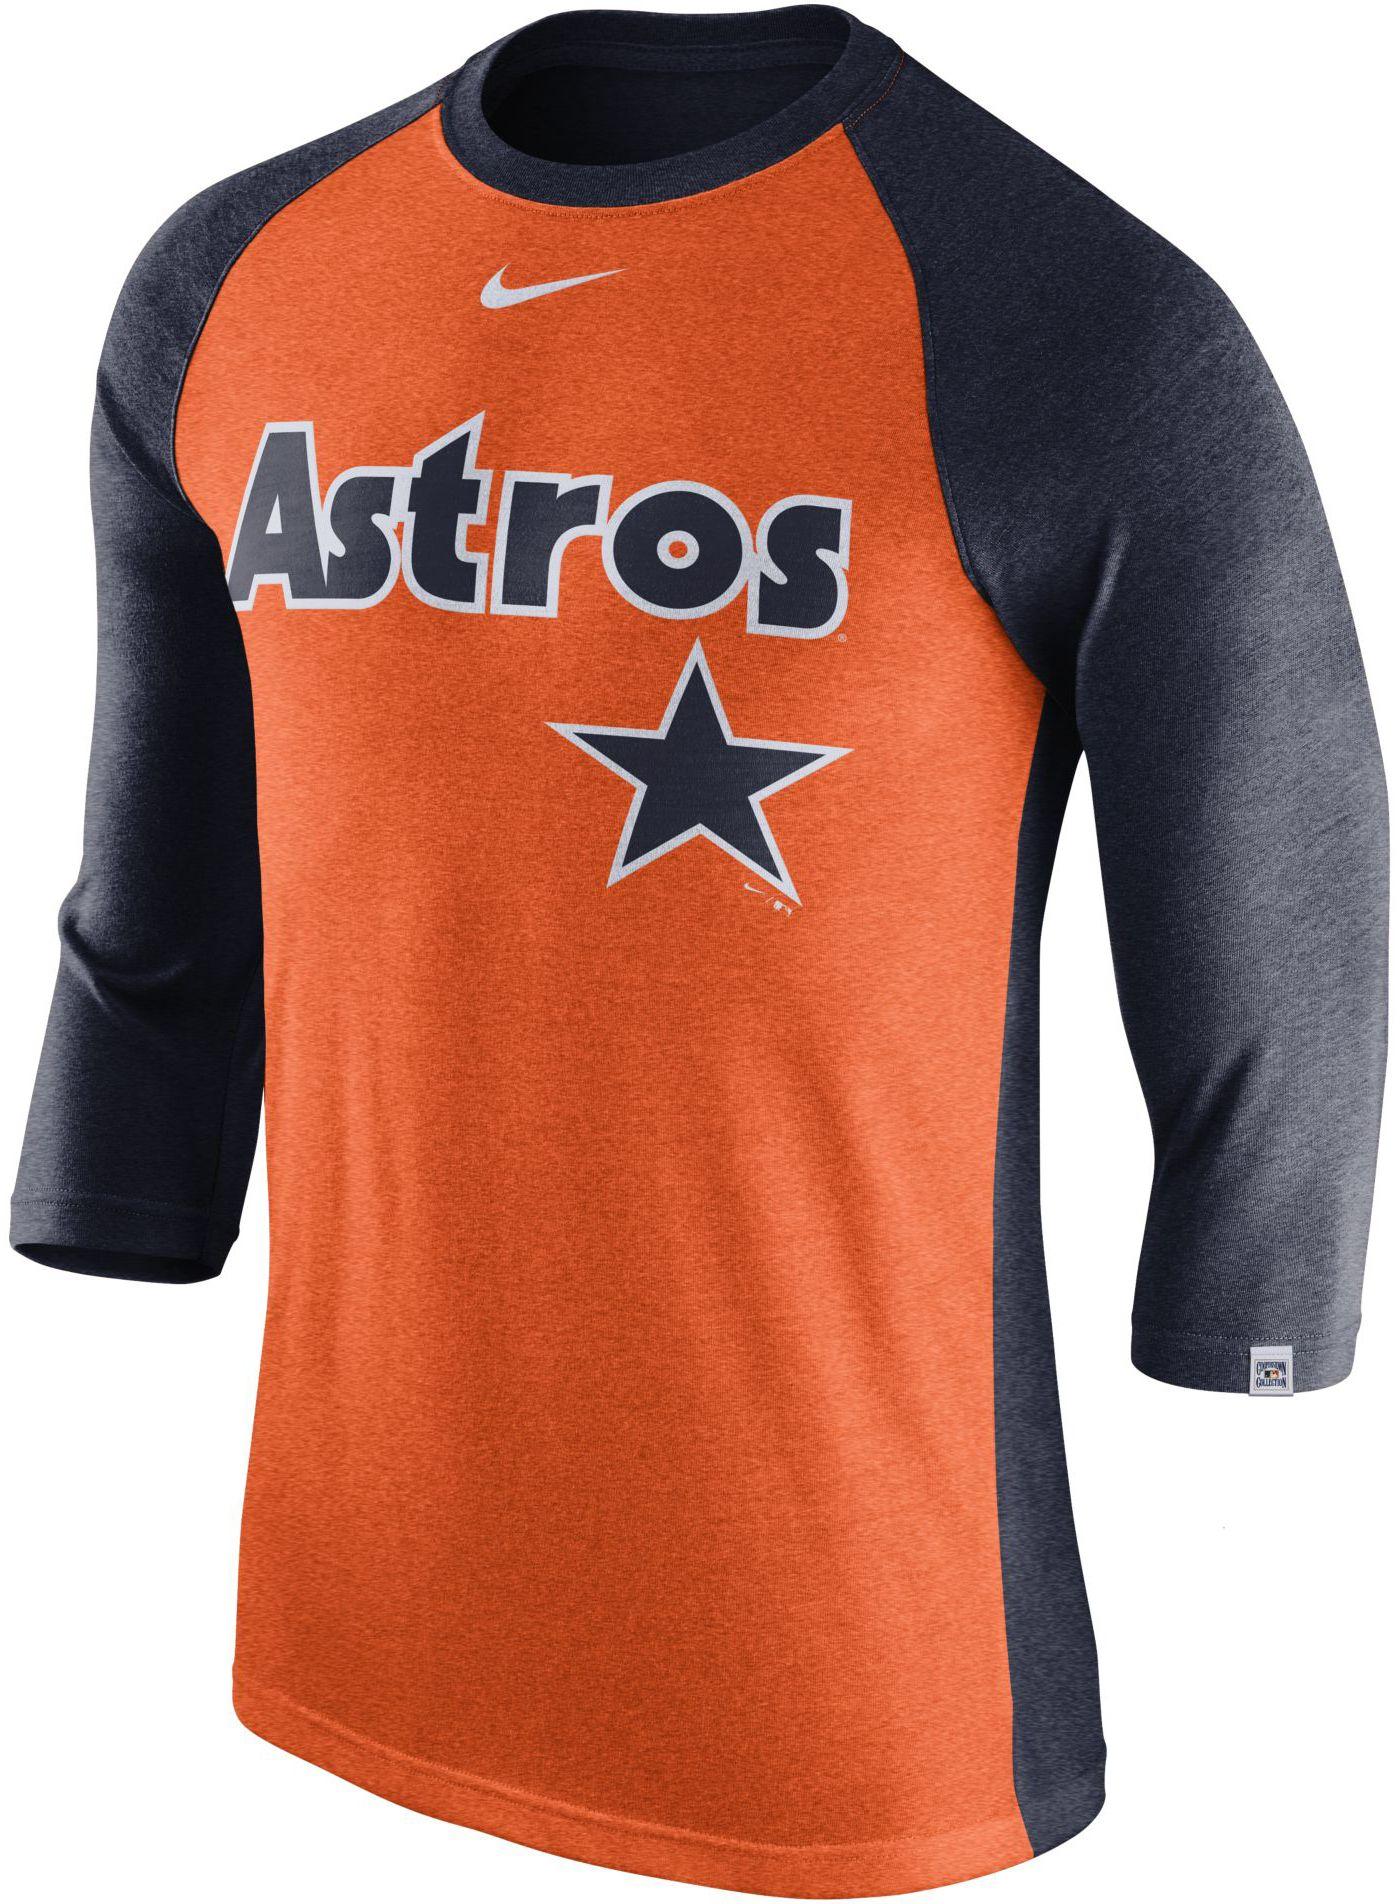 Nike Men's Houston Astros Dri-FIT Raglan Three-Quarter Sleeve Shirt